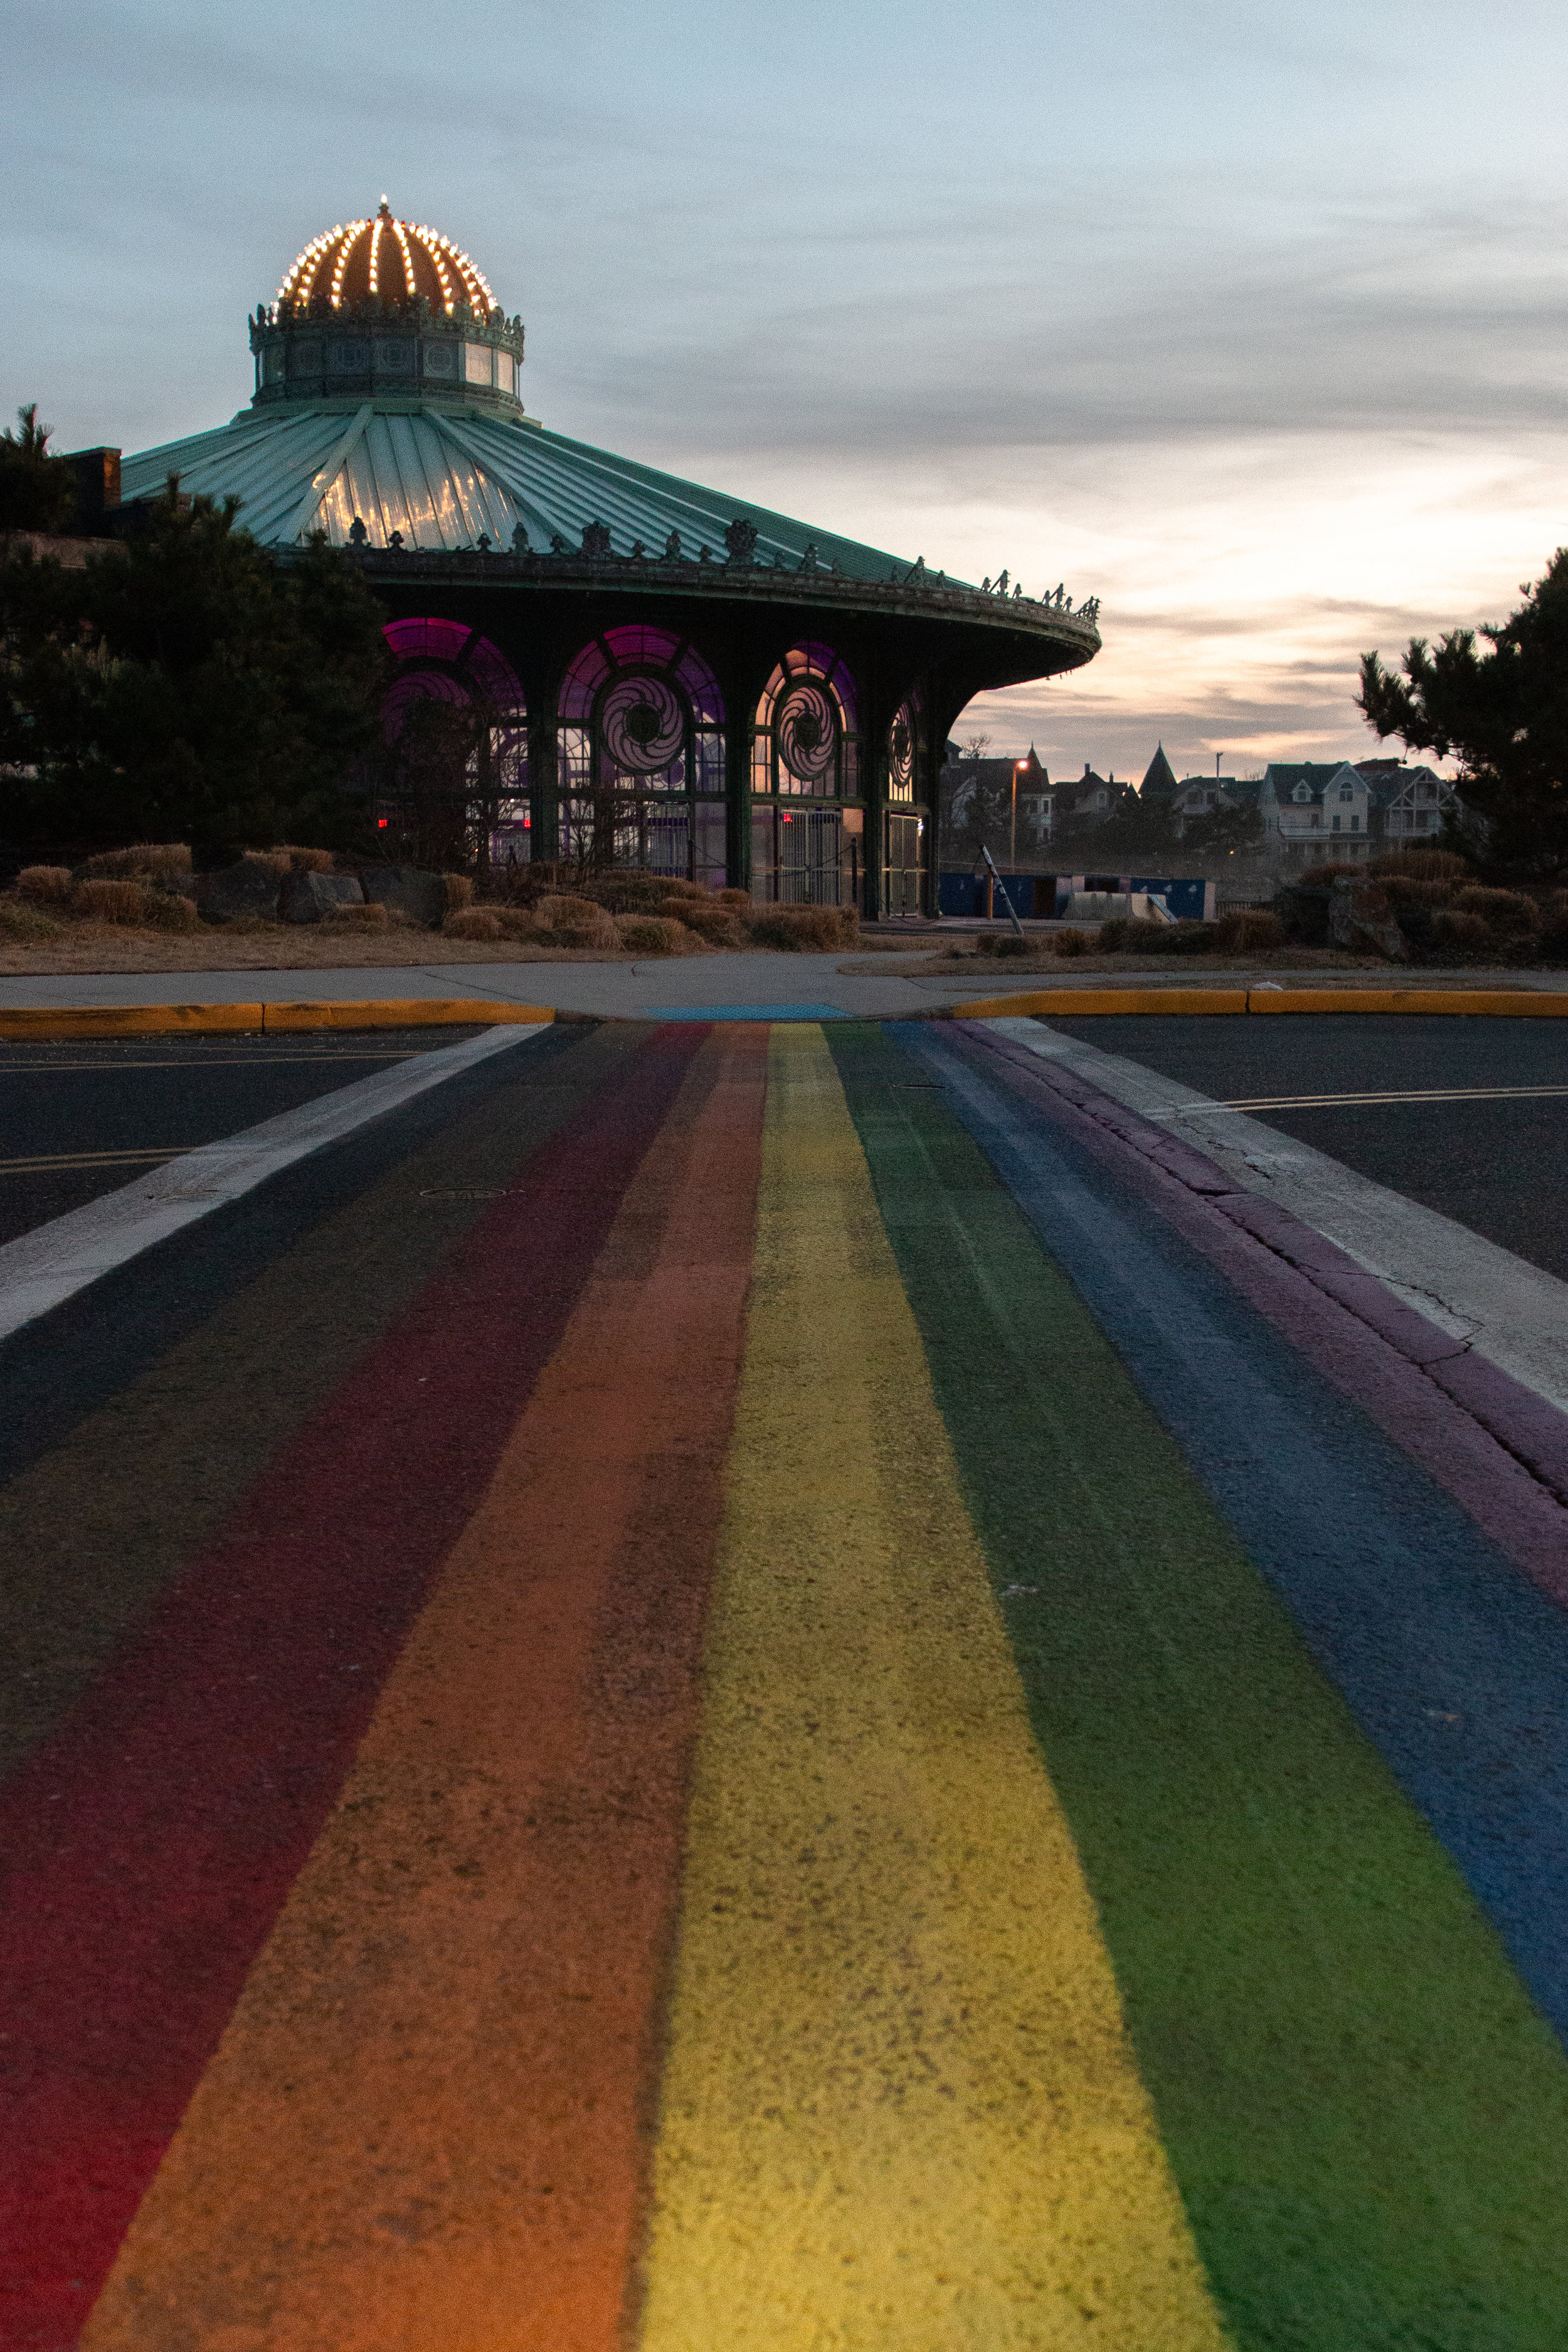 rainbow crosswalk in Asbury Park, New Jersey. Photo by Kayleigh Ann Archbold.